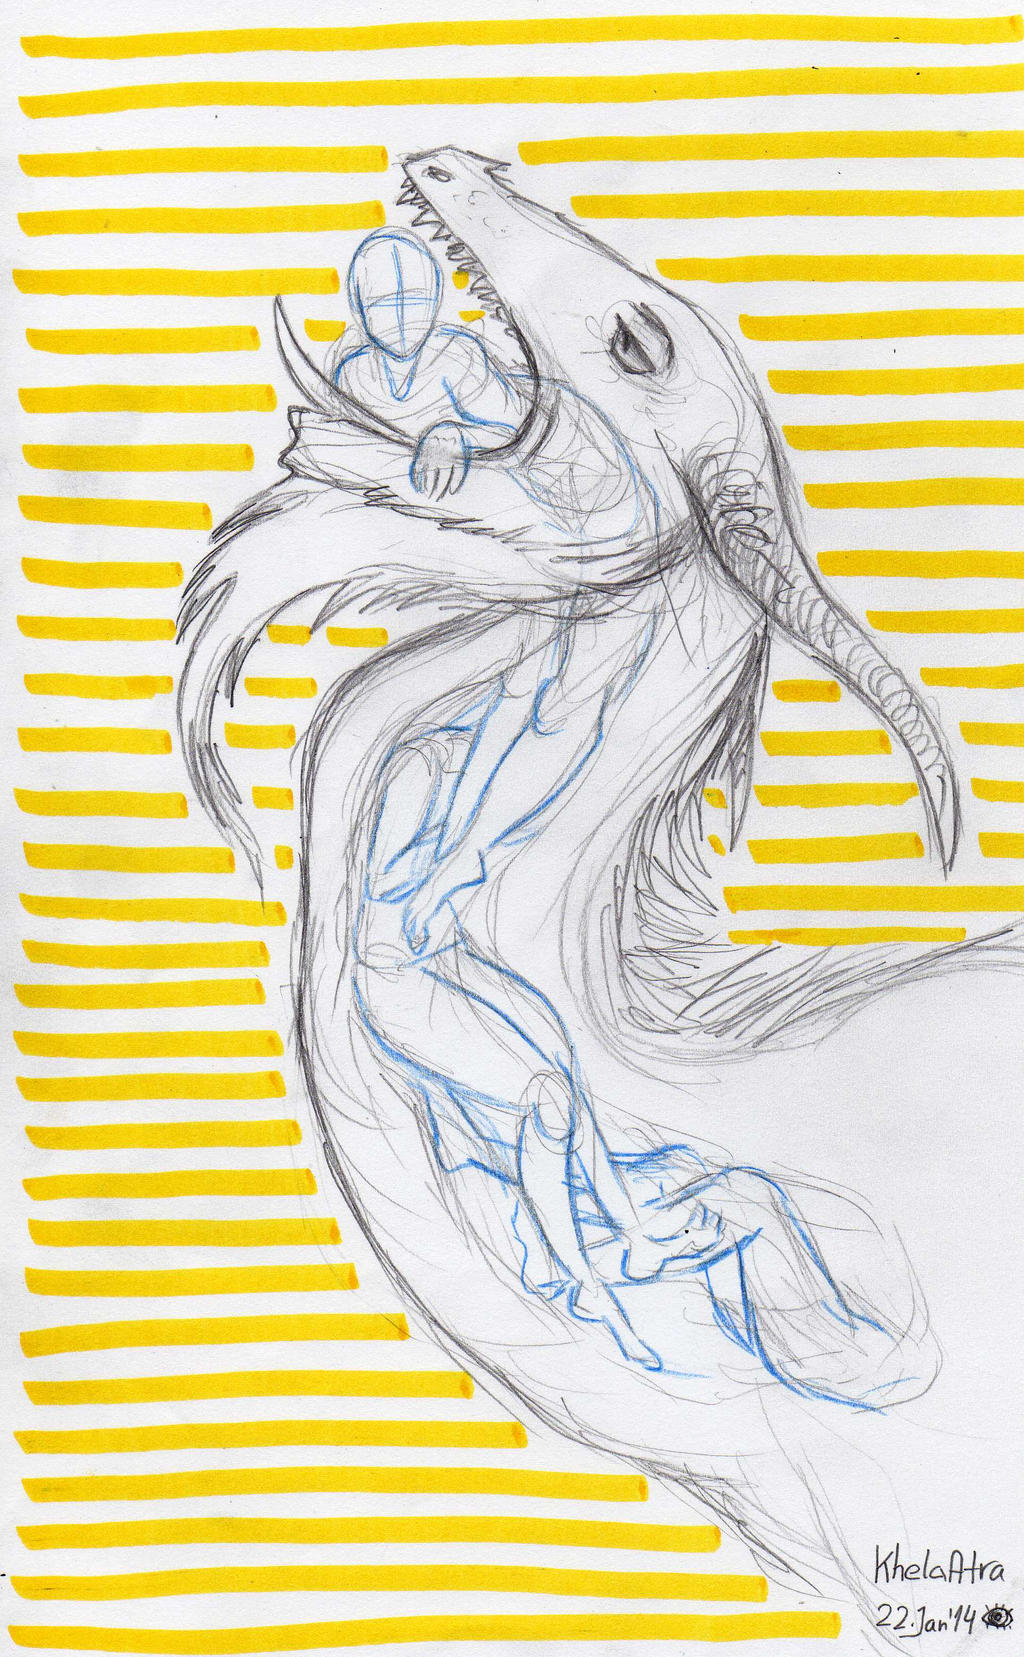 Dragon Vore Sketch Jan'14 by KhelaAtra